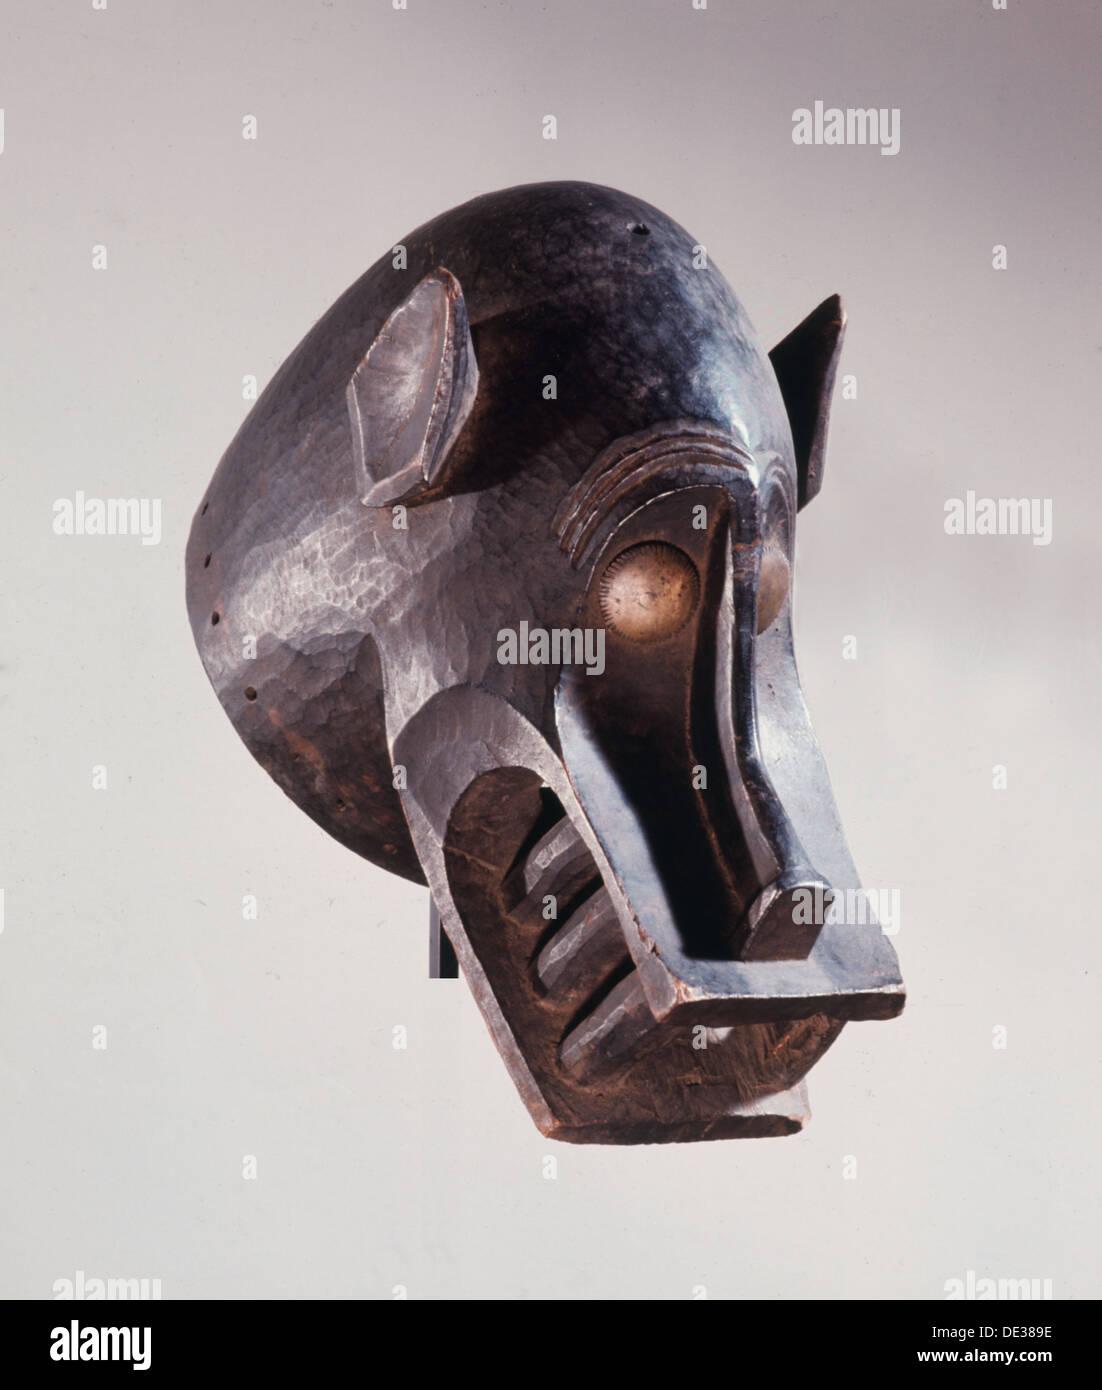 Senufo kunugbaha mask used in anti-witchcraft rites. - Stock Image